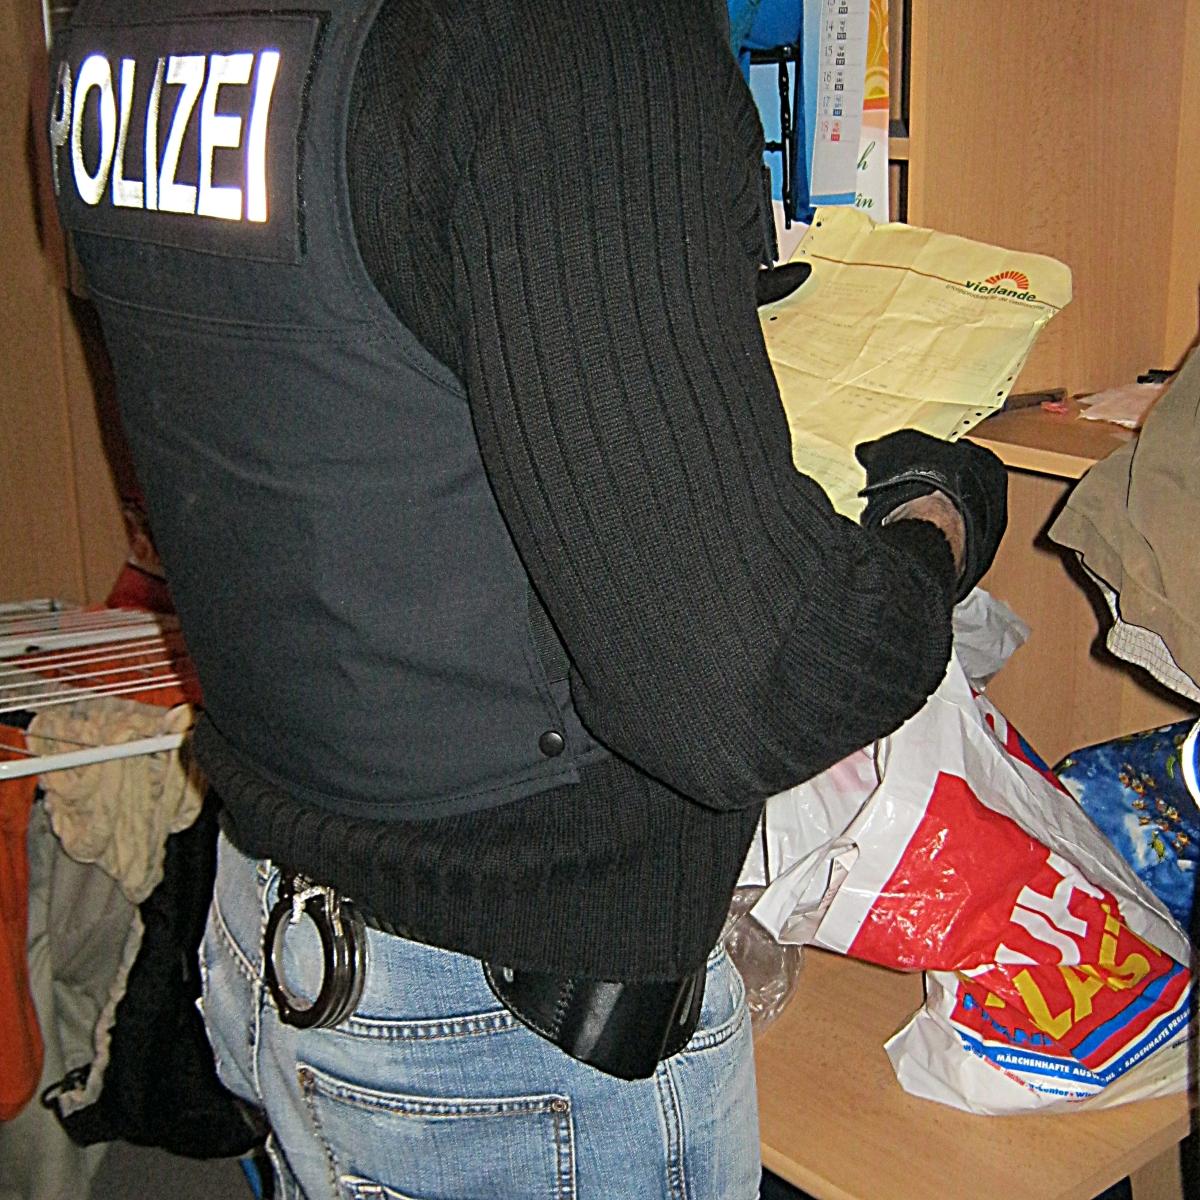 Polizei Razzia